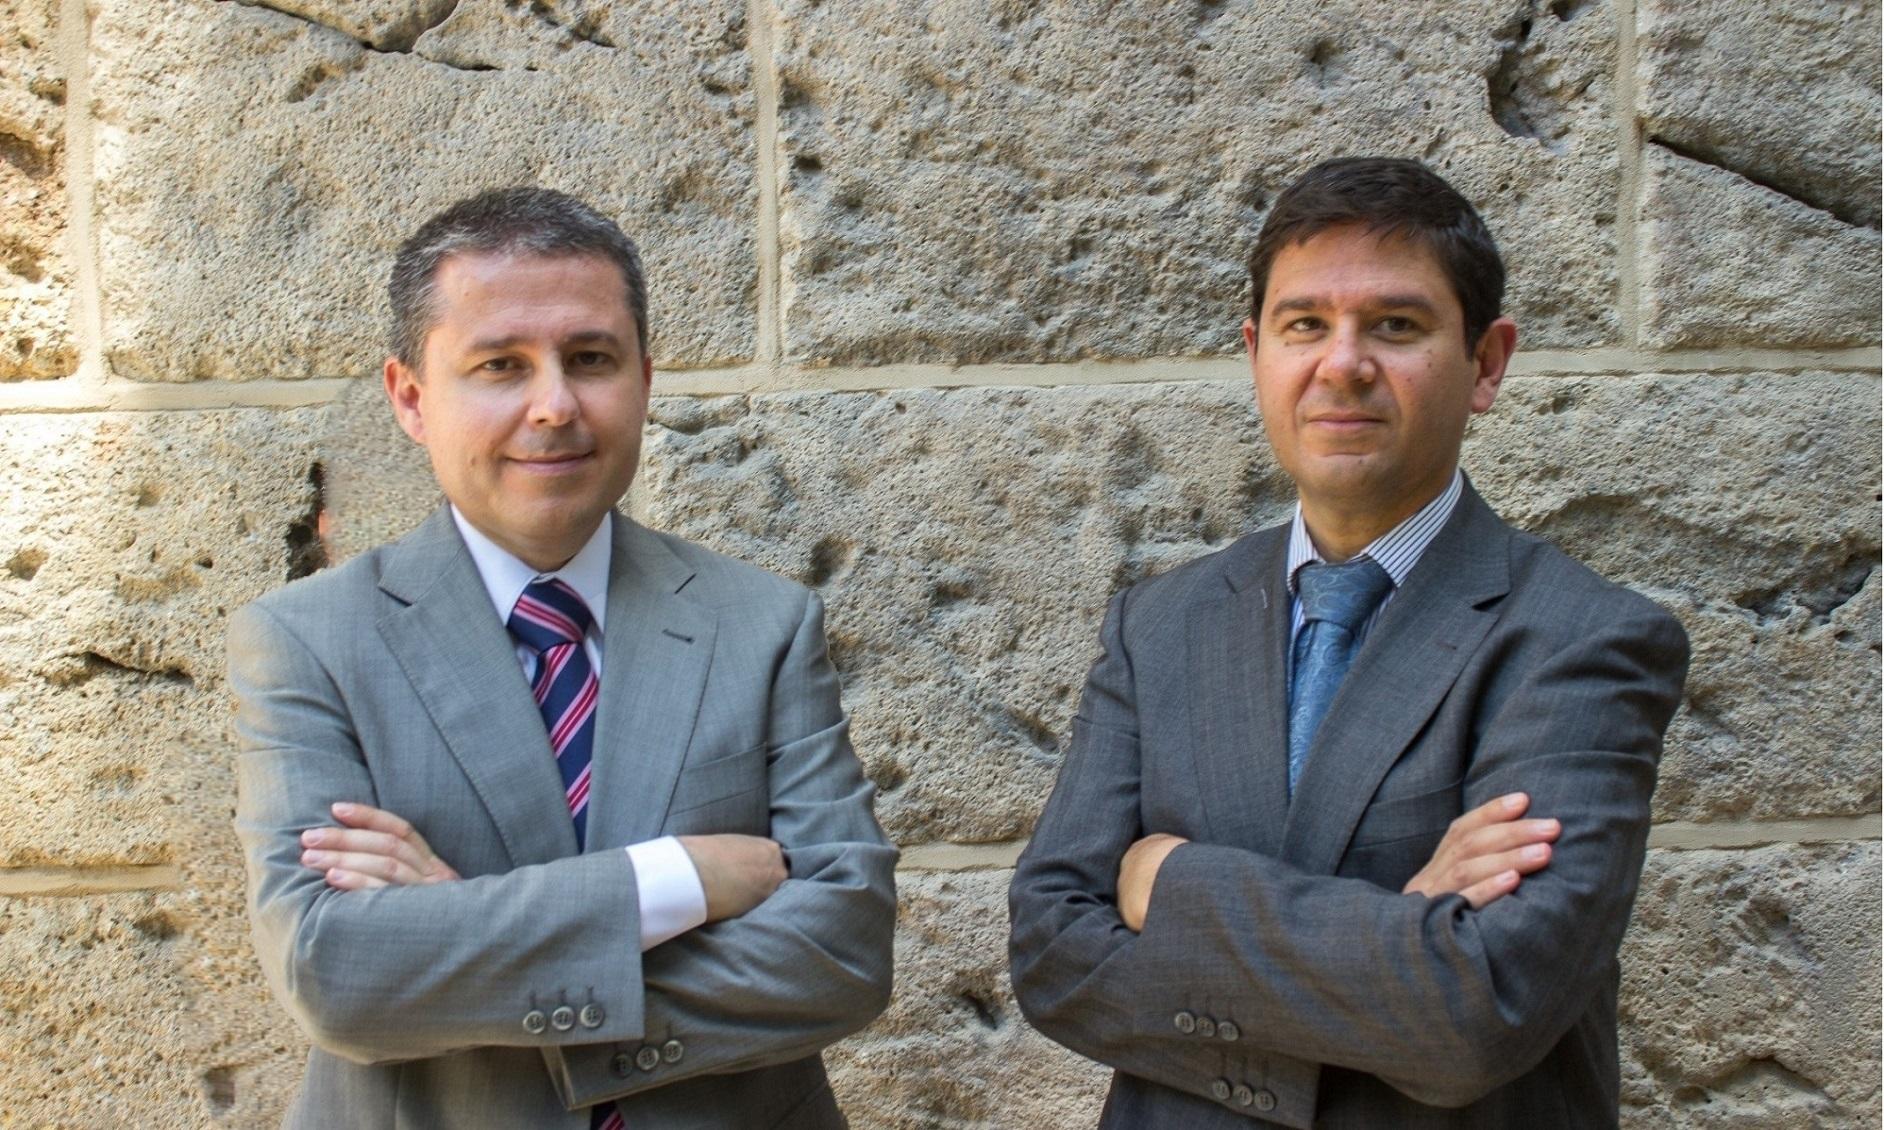 Equipo multidisciplinar abogados economistas málaga nerja